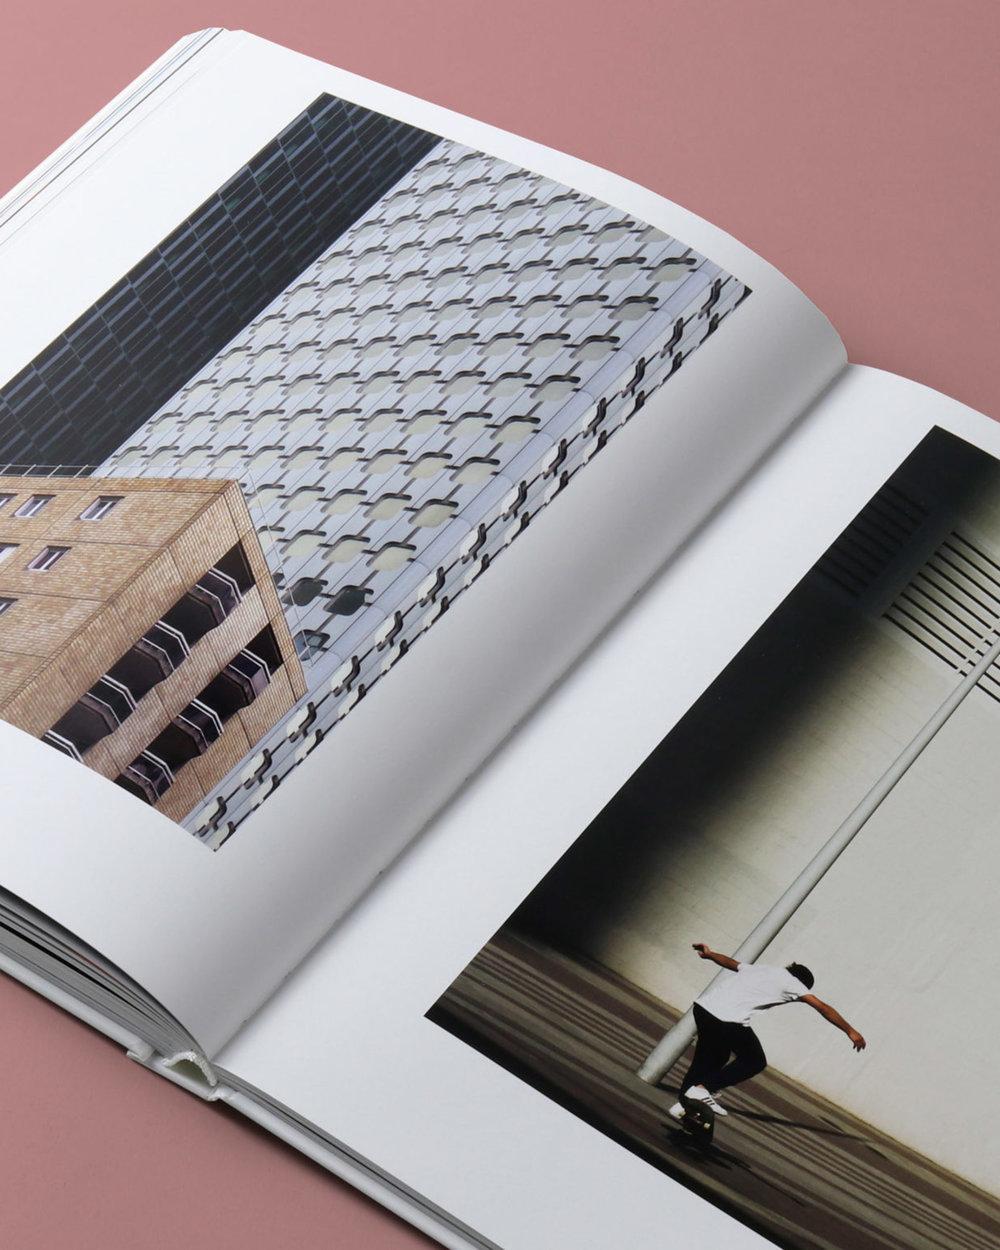 mendo-book-streets-of-paris-studio-20-e1537443288560-2000x2500-c-default.jpg